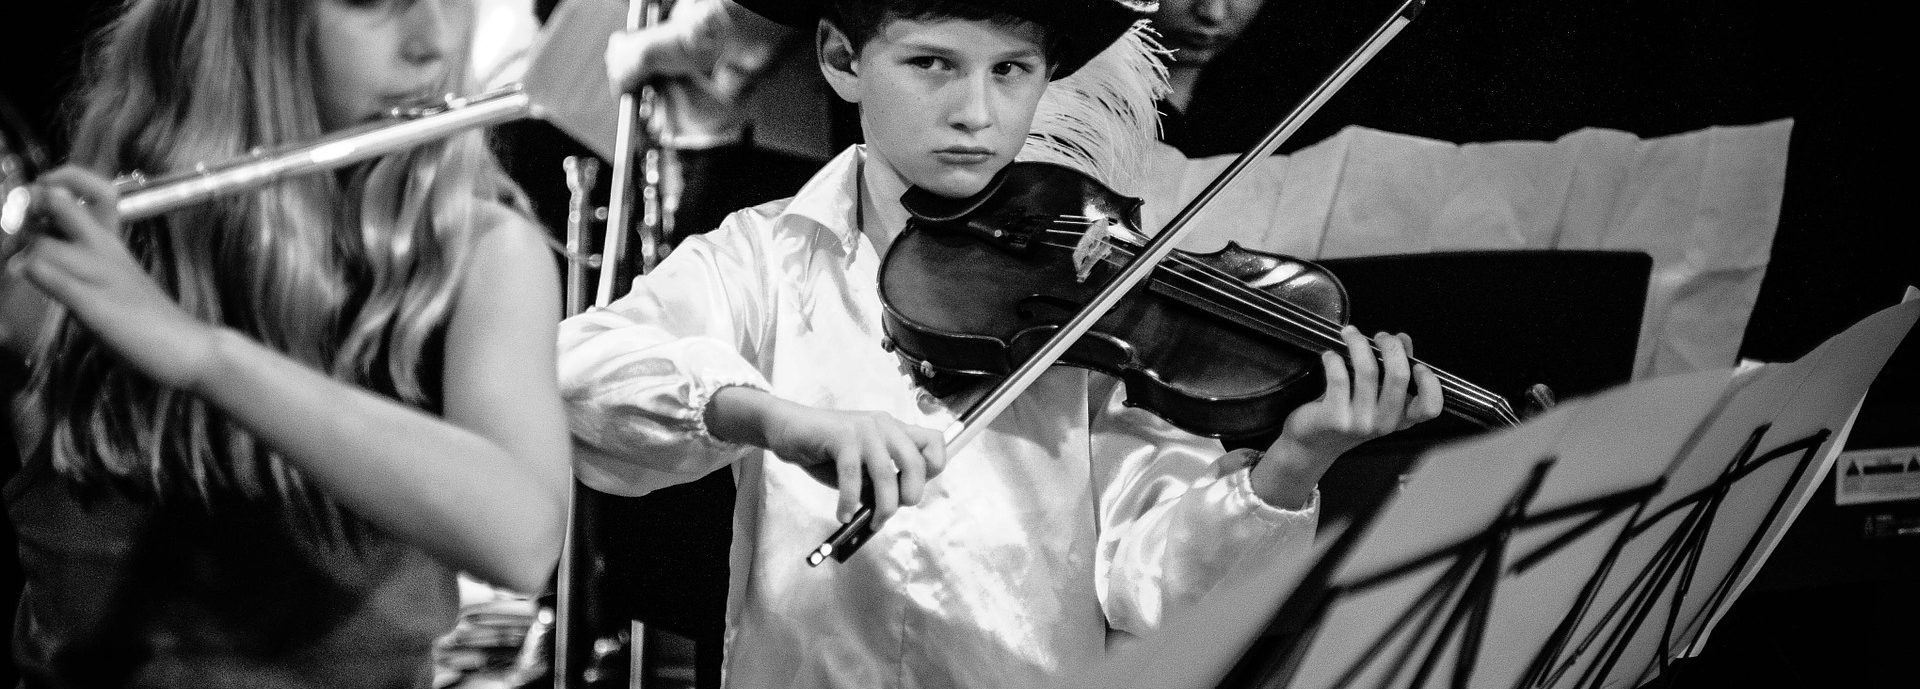 Music/Learn